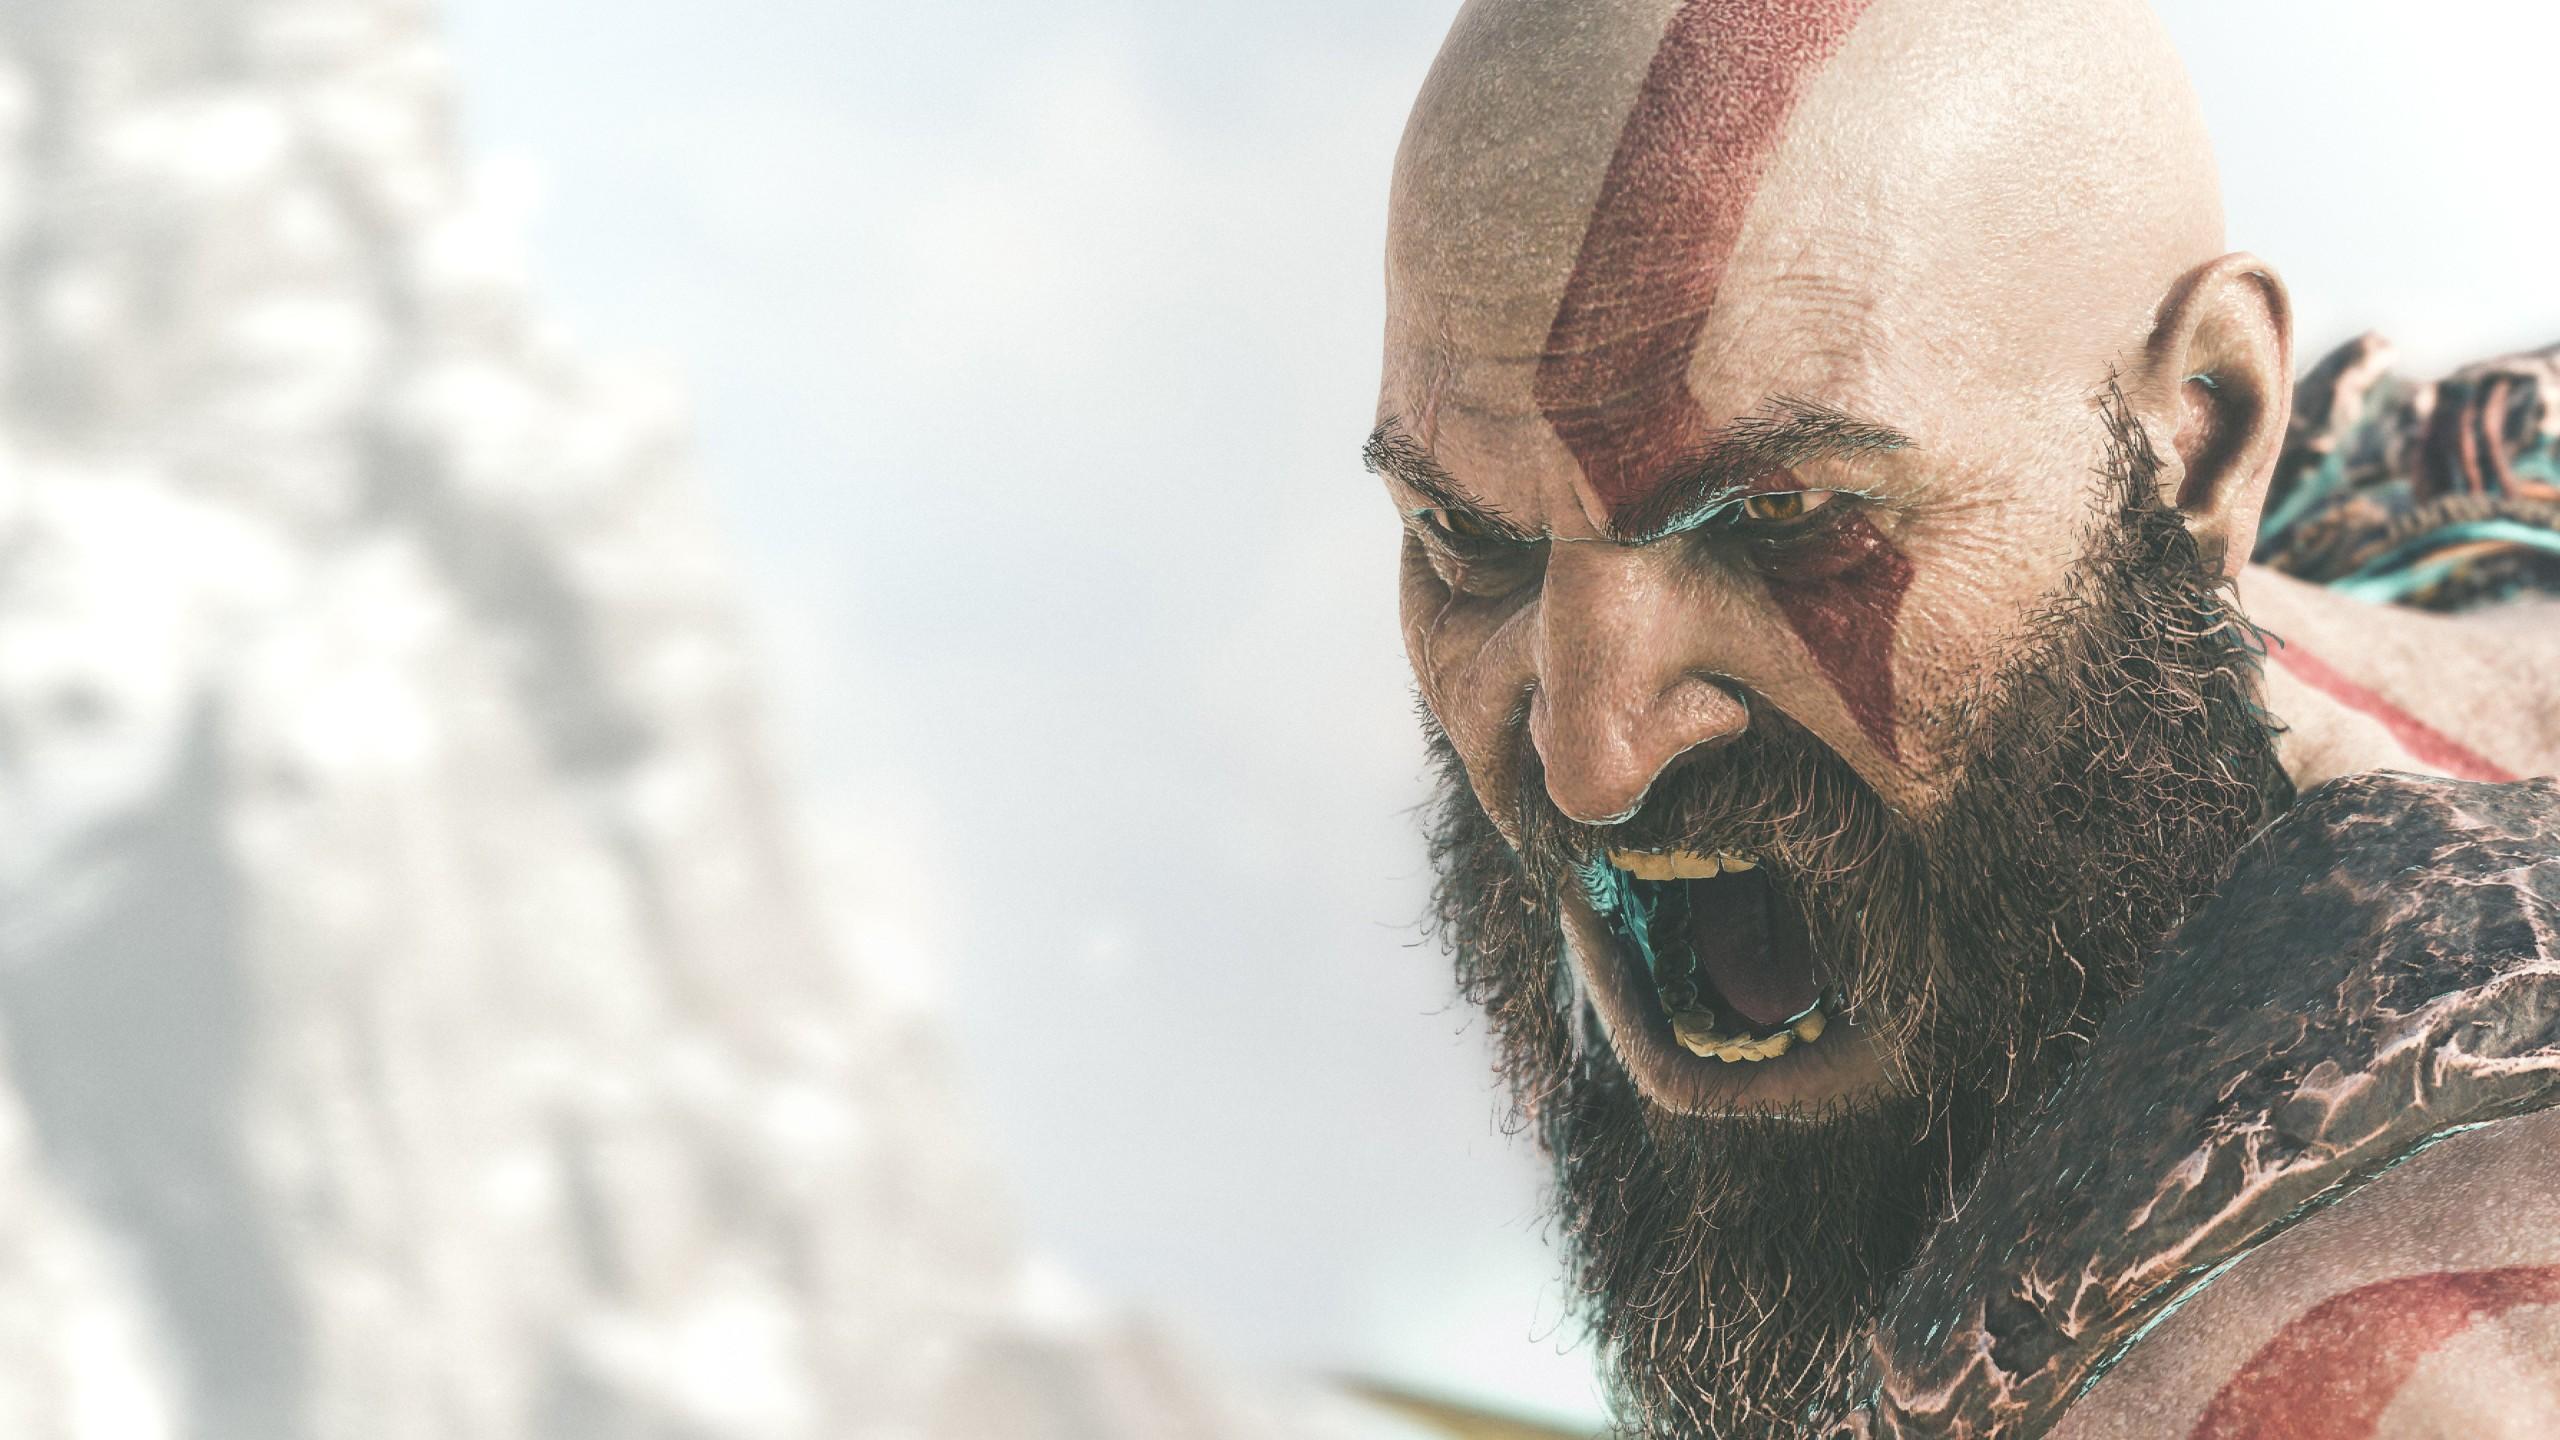 God Of War Wallpaper Hd 3d Download Kratos In God Of War 4k Wallpapers Hd Wallpapers Id 25771